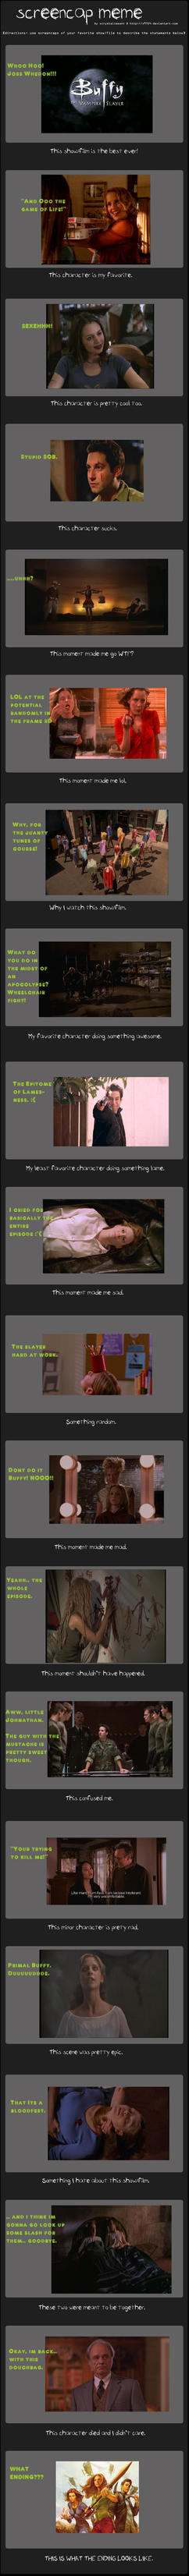 Buffy Screencap Meme by BloodyAwfulLips